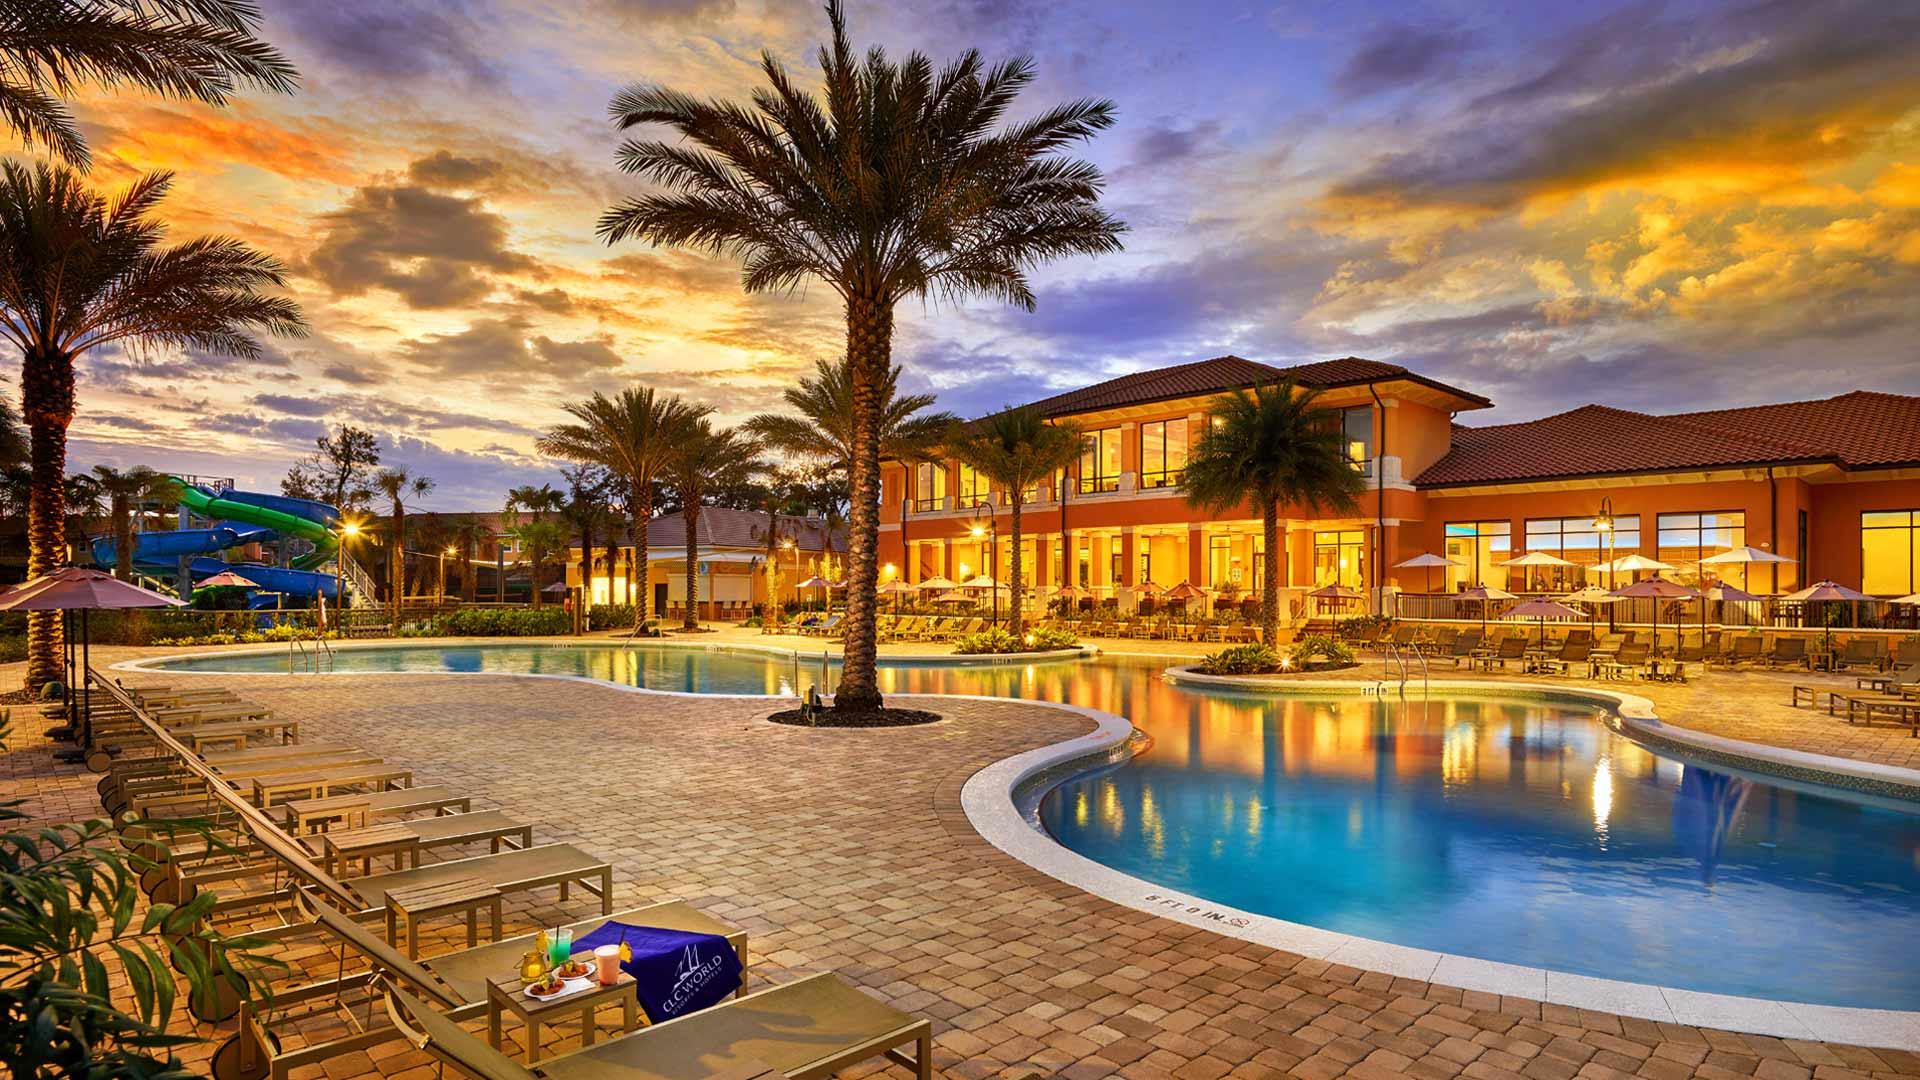 Clc Regal Oaks Vacation Townhomes Near Orlando Clc Regal Oaks Resort